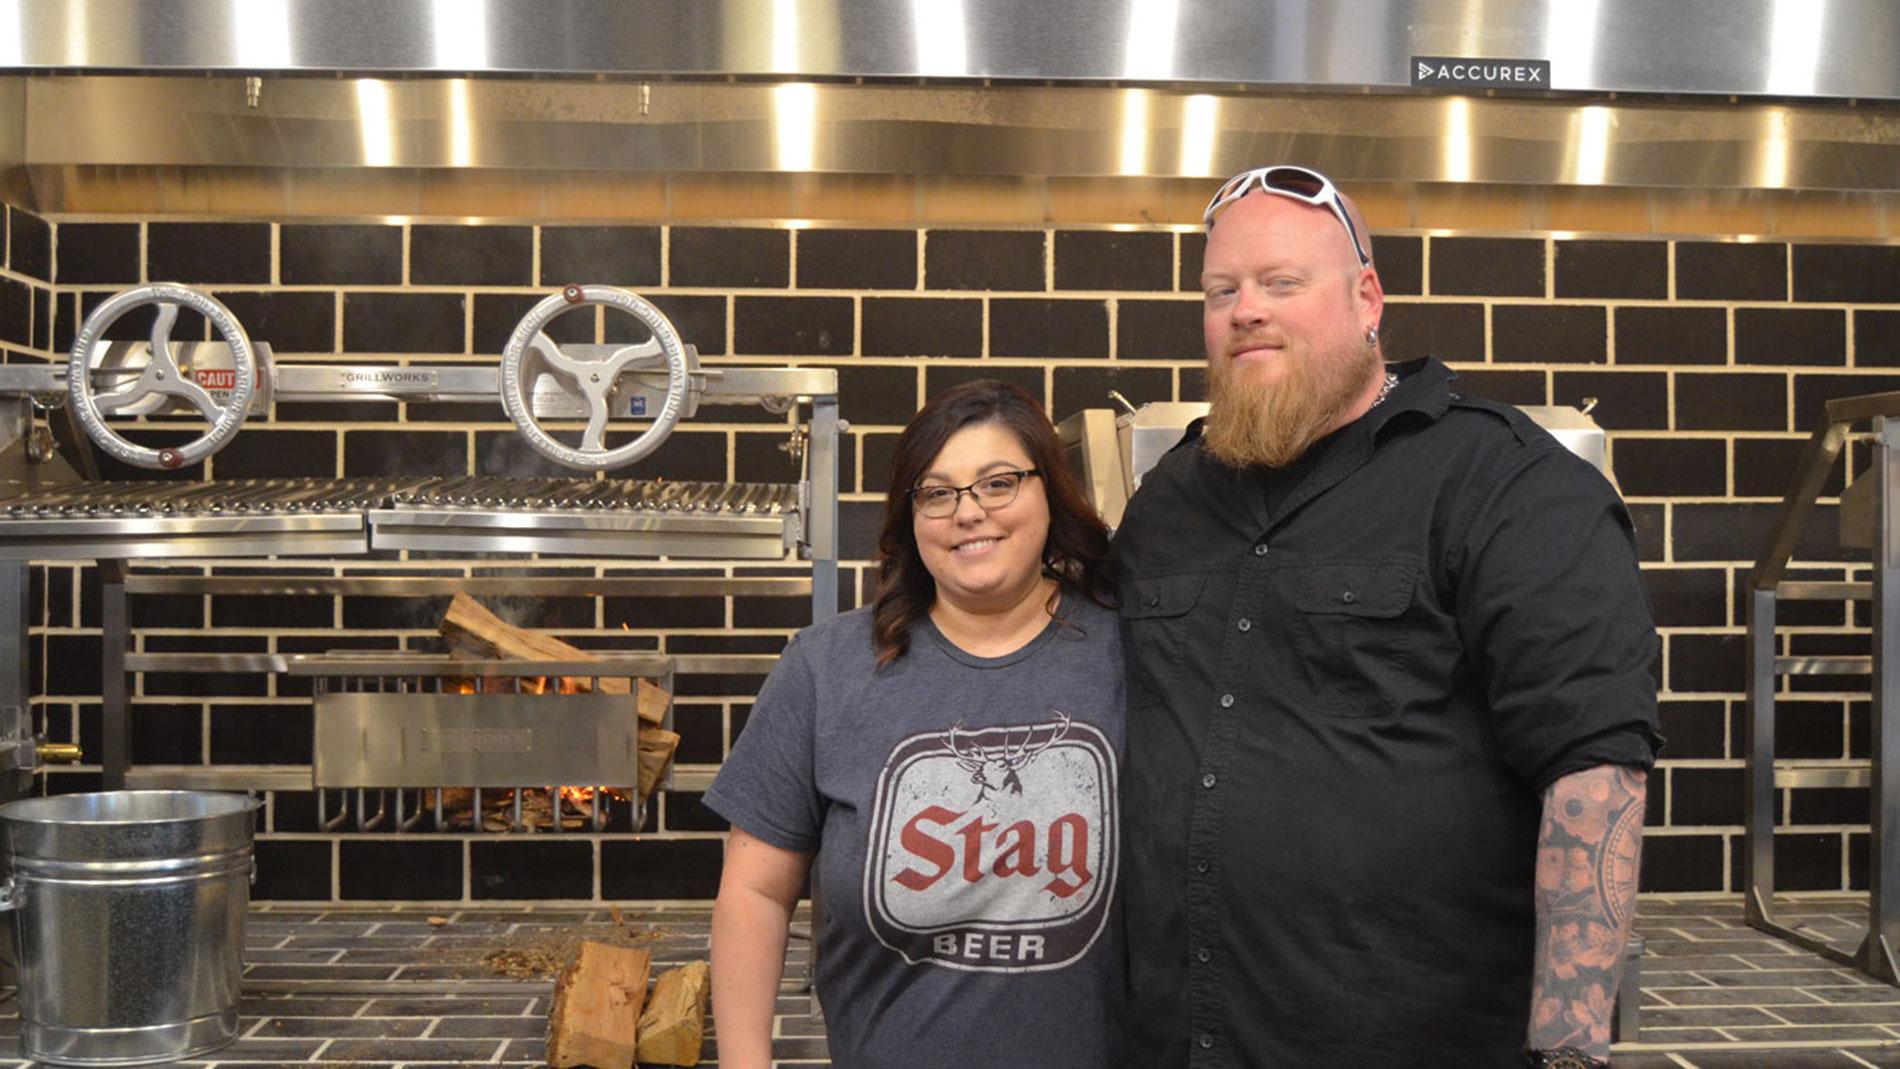 BEAST craft bbq co-owners David and Meggan Sandusky